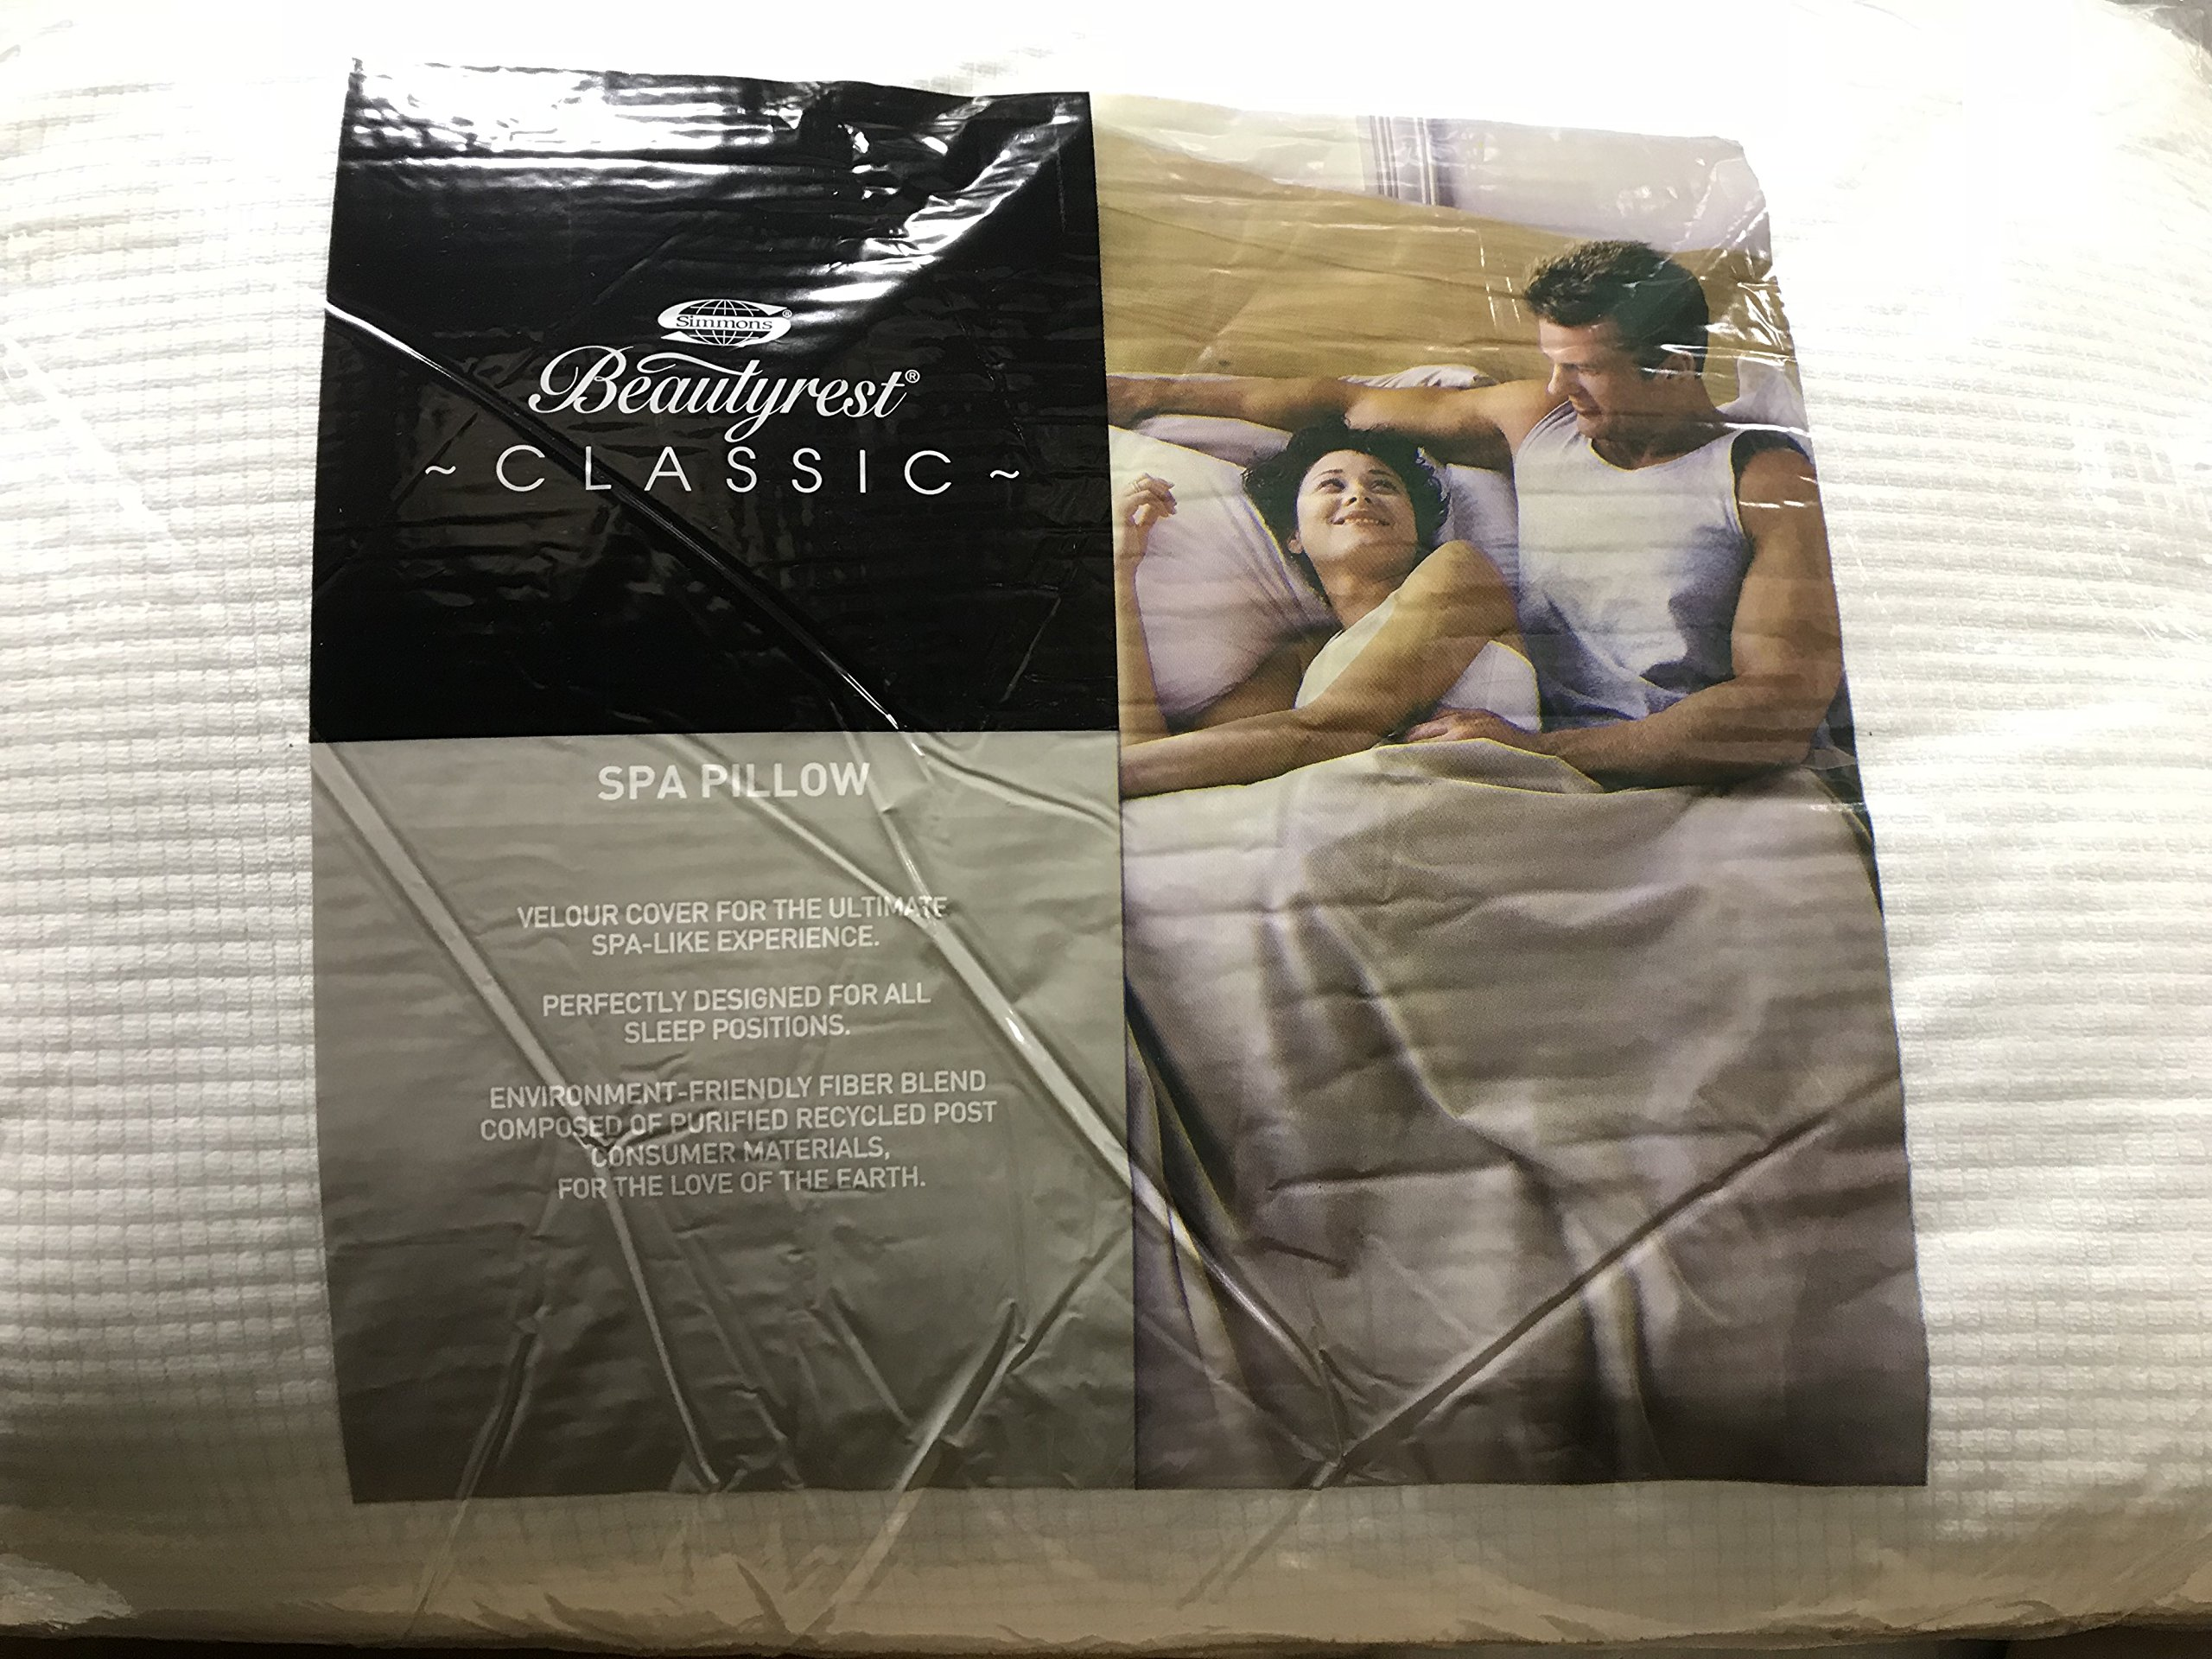 Beautyrest Classic Spa Pillow, Jumbo/Queen